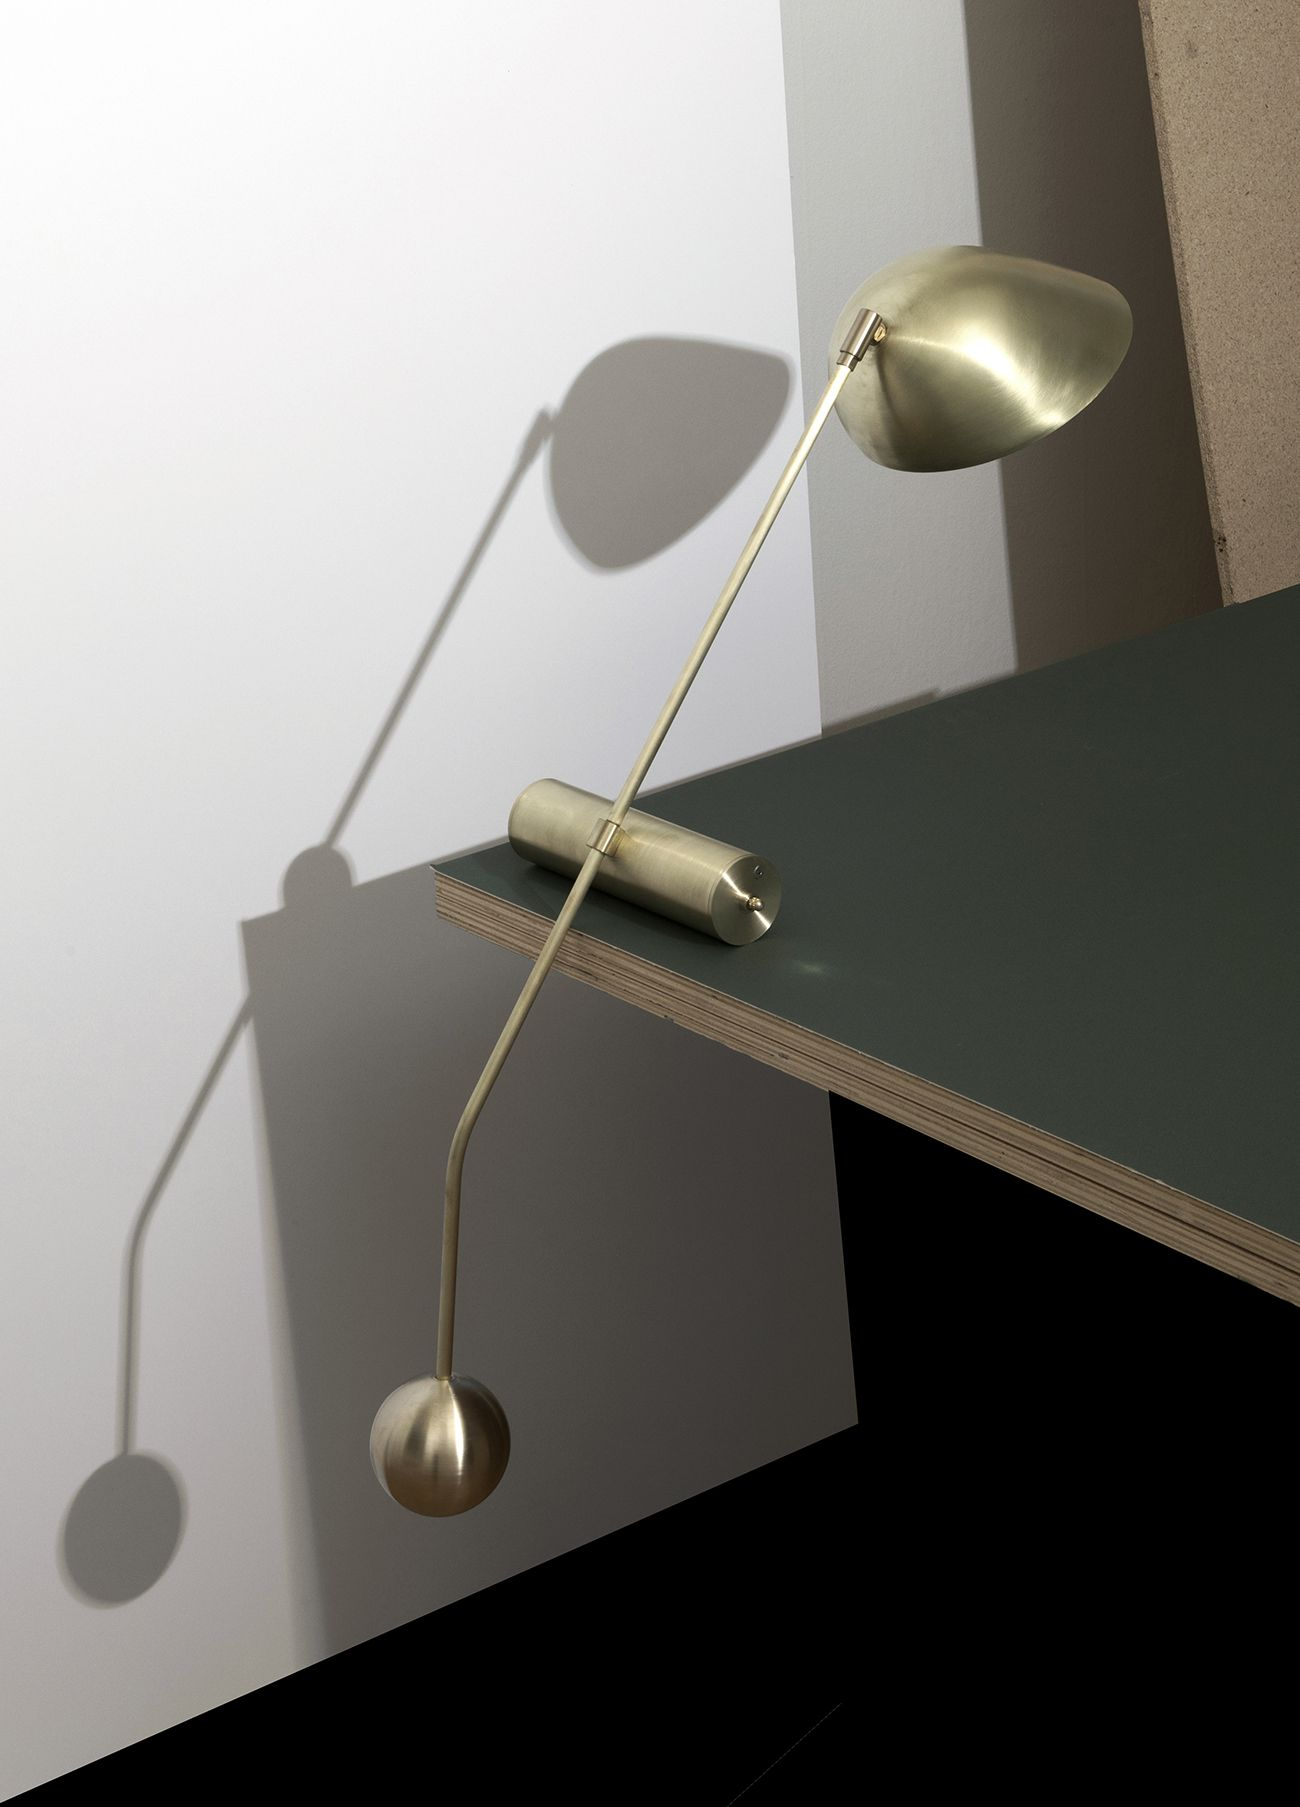 Attune lamp rejuvenation design team tiffany table lamps large table lamps bedside table lamps